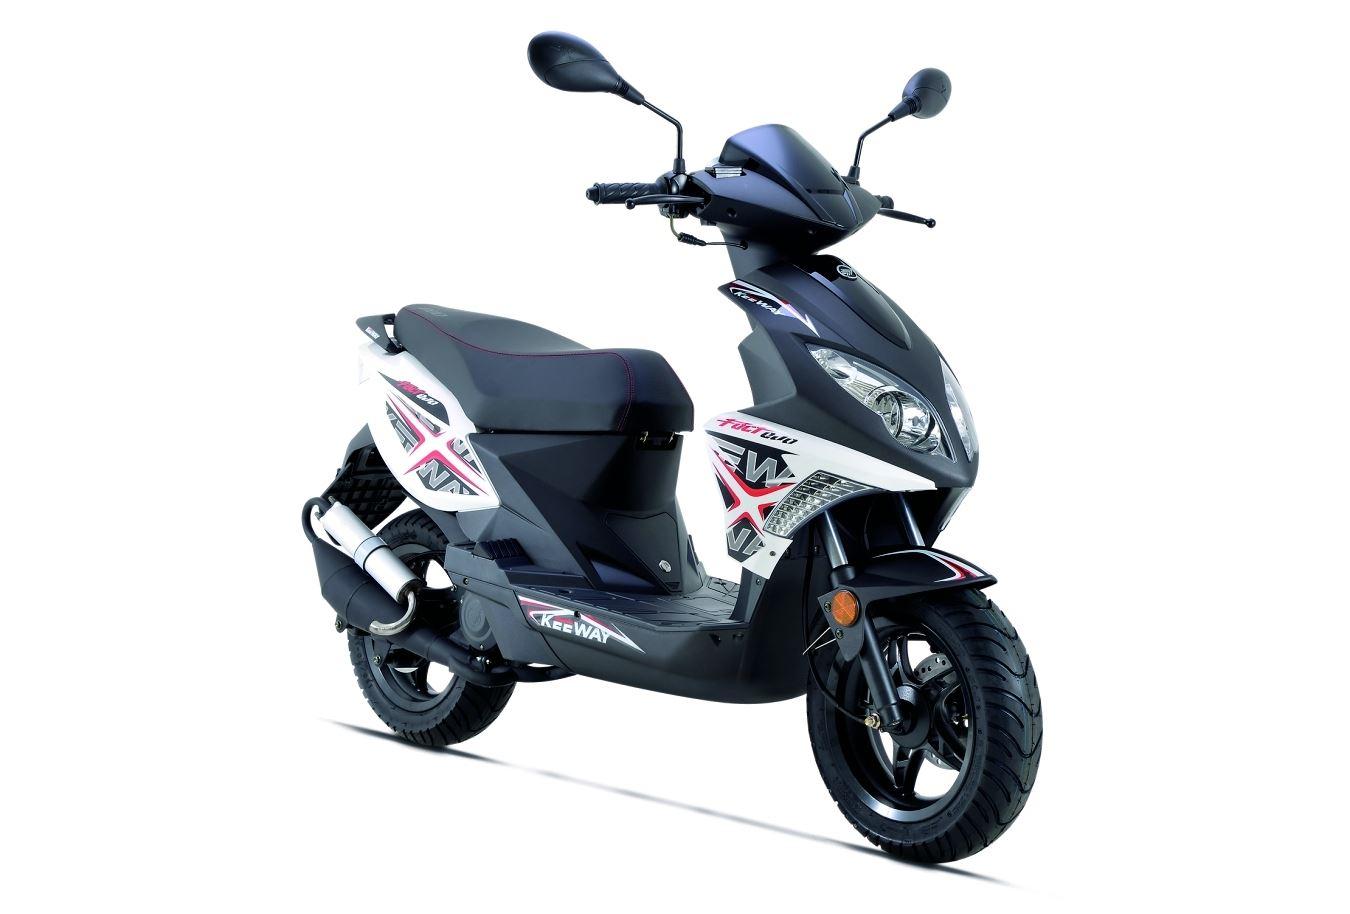 comparar keeway f act evo 50 com piaggio fly 50 2t andar de moto. Black Bedroom Furniture Sets. Home Design Ideas